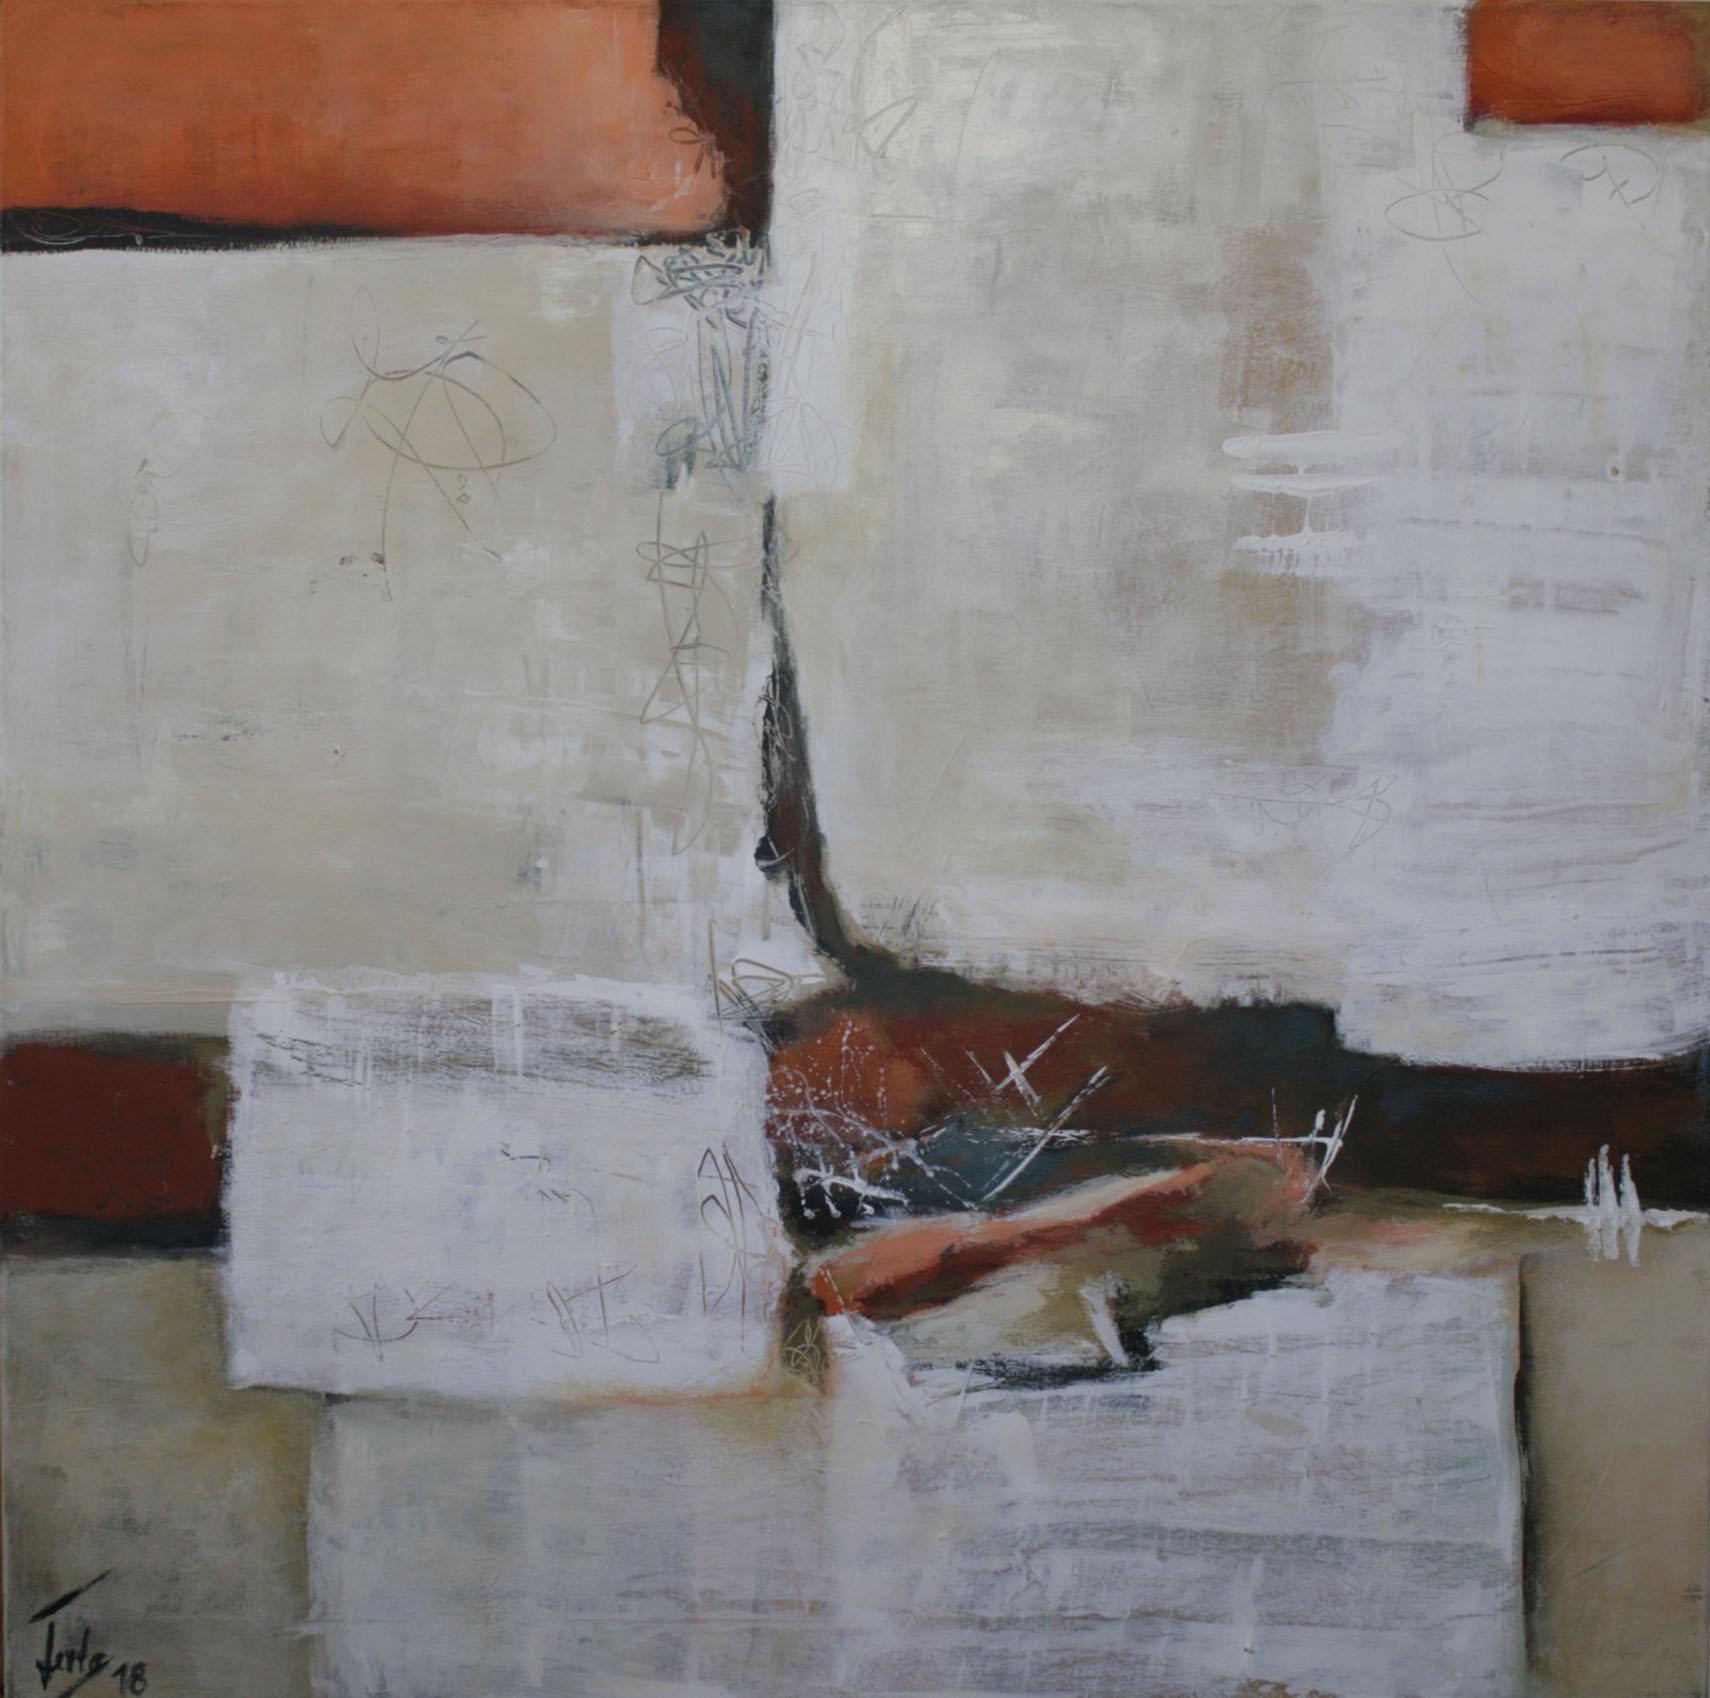 Ohne Titel 1809, Öl und Acryl auf Leinwand, 2018, 110 x 110 cm